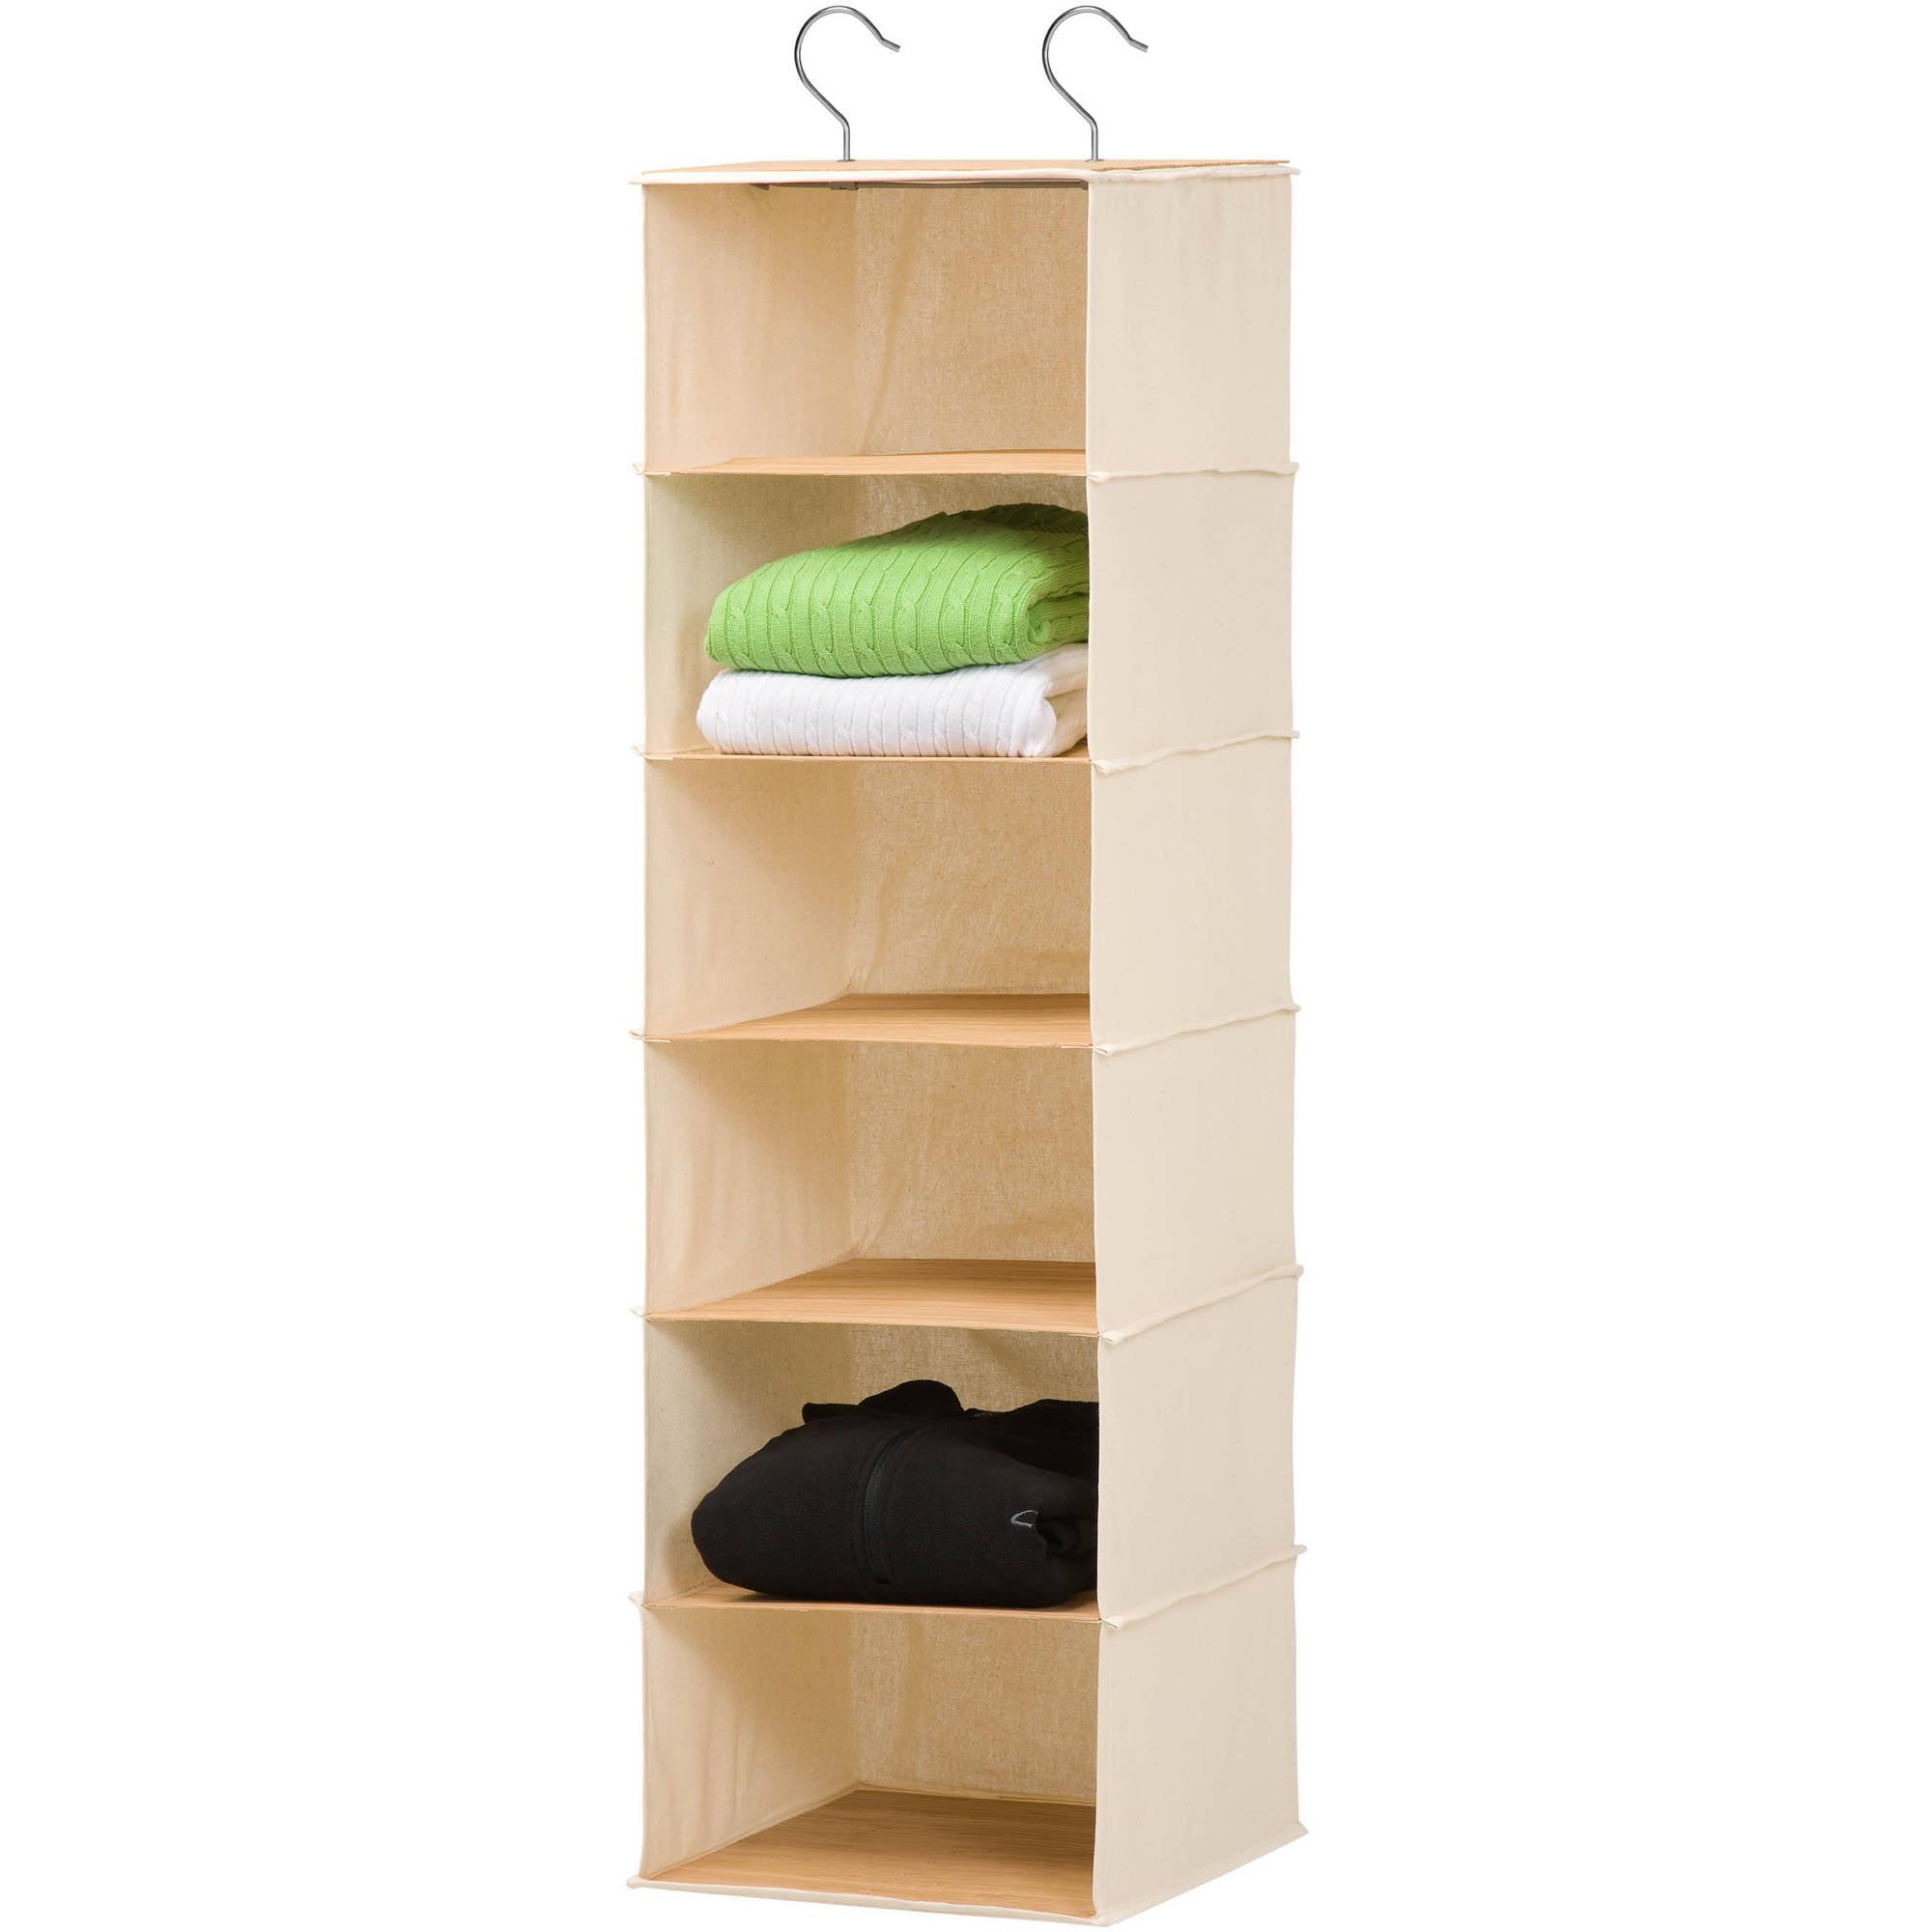 Honey Can Do 6 Shelf Hanging Organizer, Bamboo by Honey Can Do